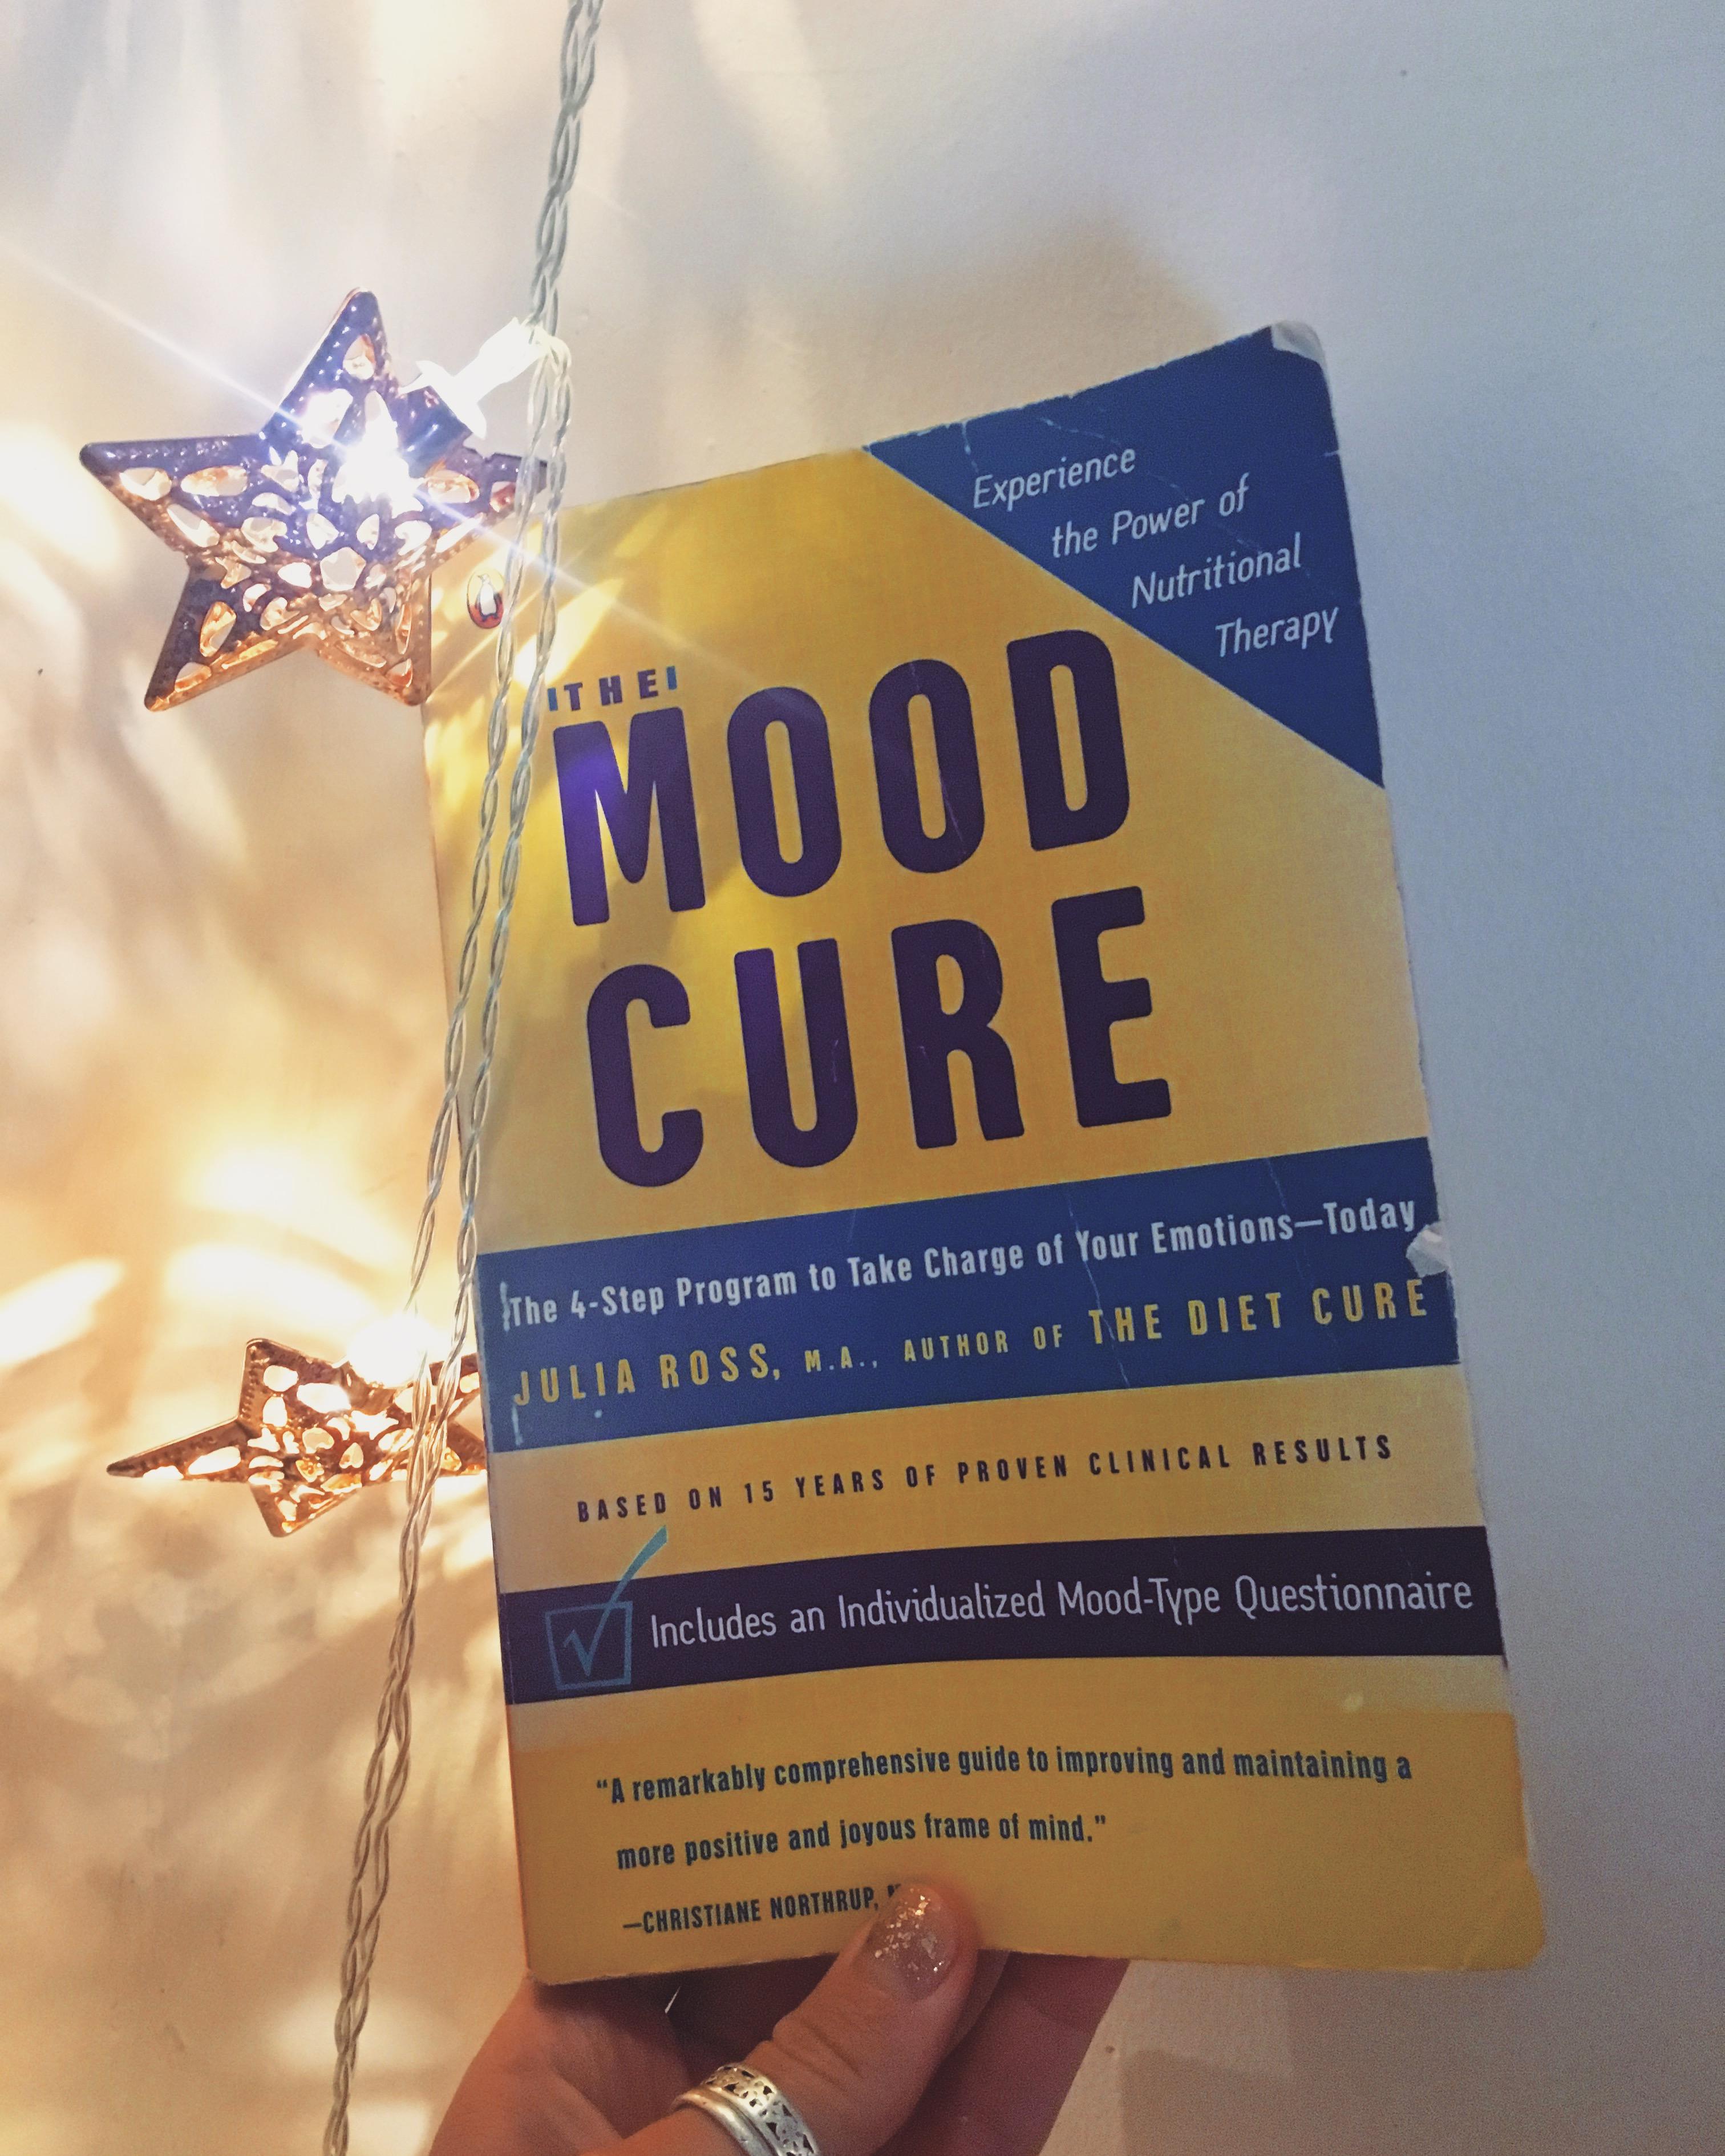 Mood Cure